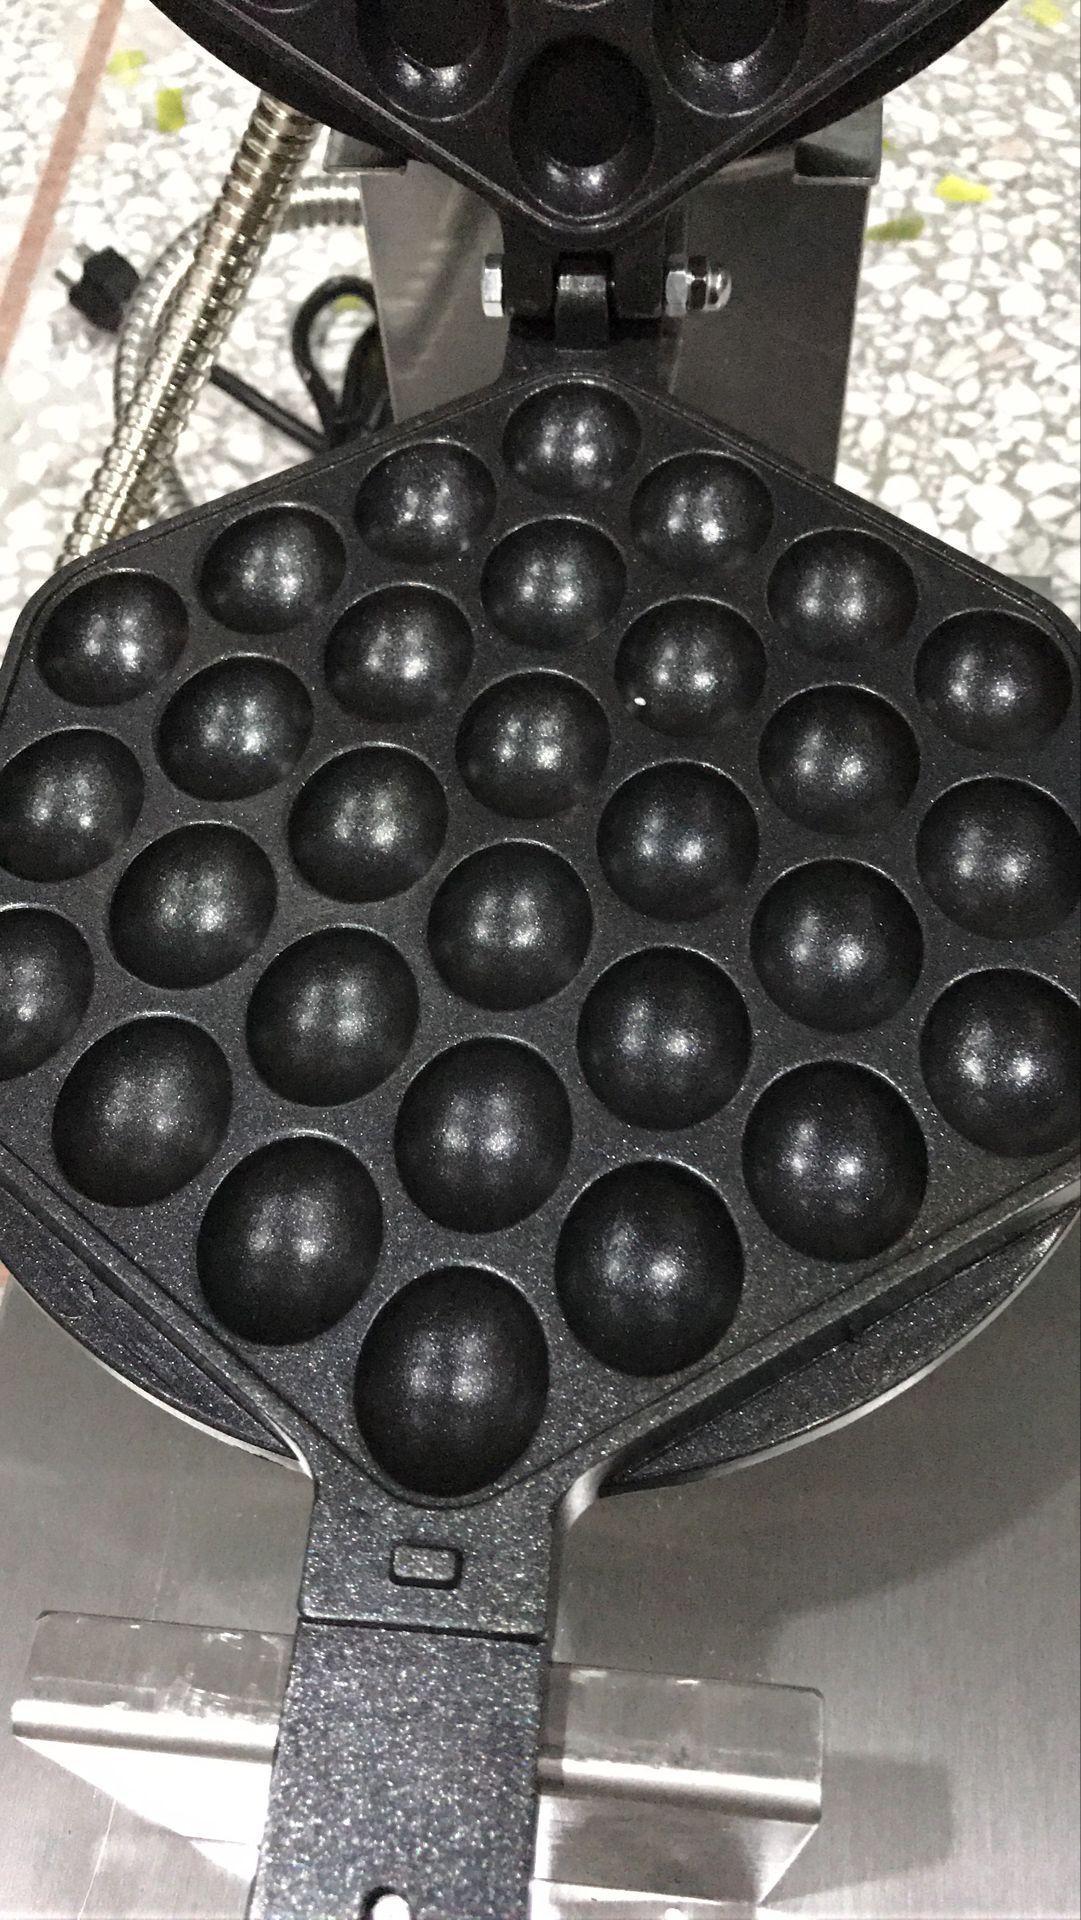 Envío gratuito eléctrico 110 V 220 V Bubble Egg Waffle Maker Hong Kong Waffle Machine Egg Puffs